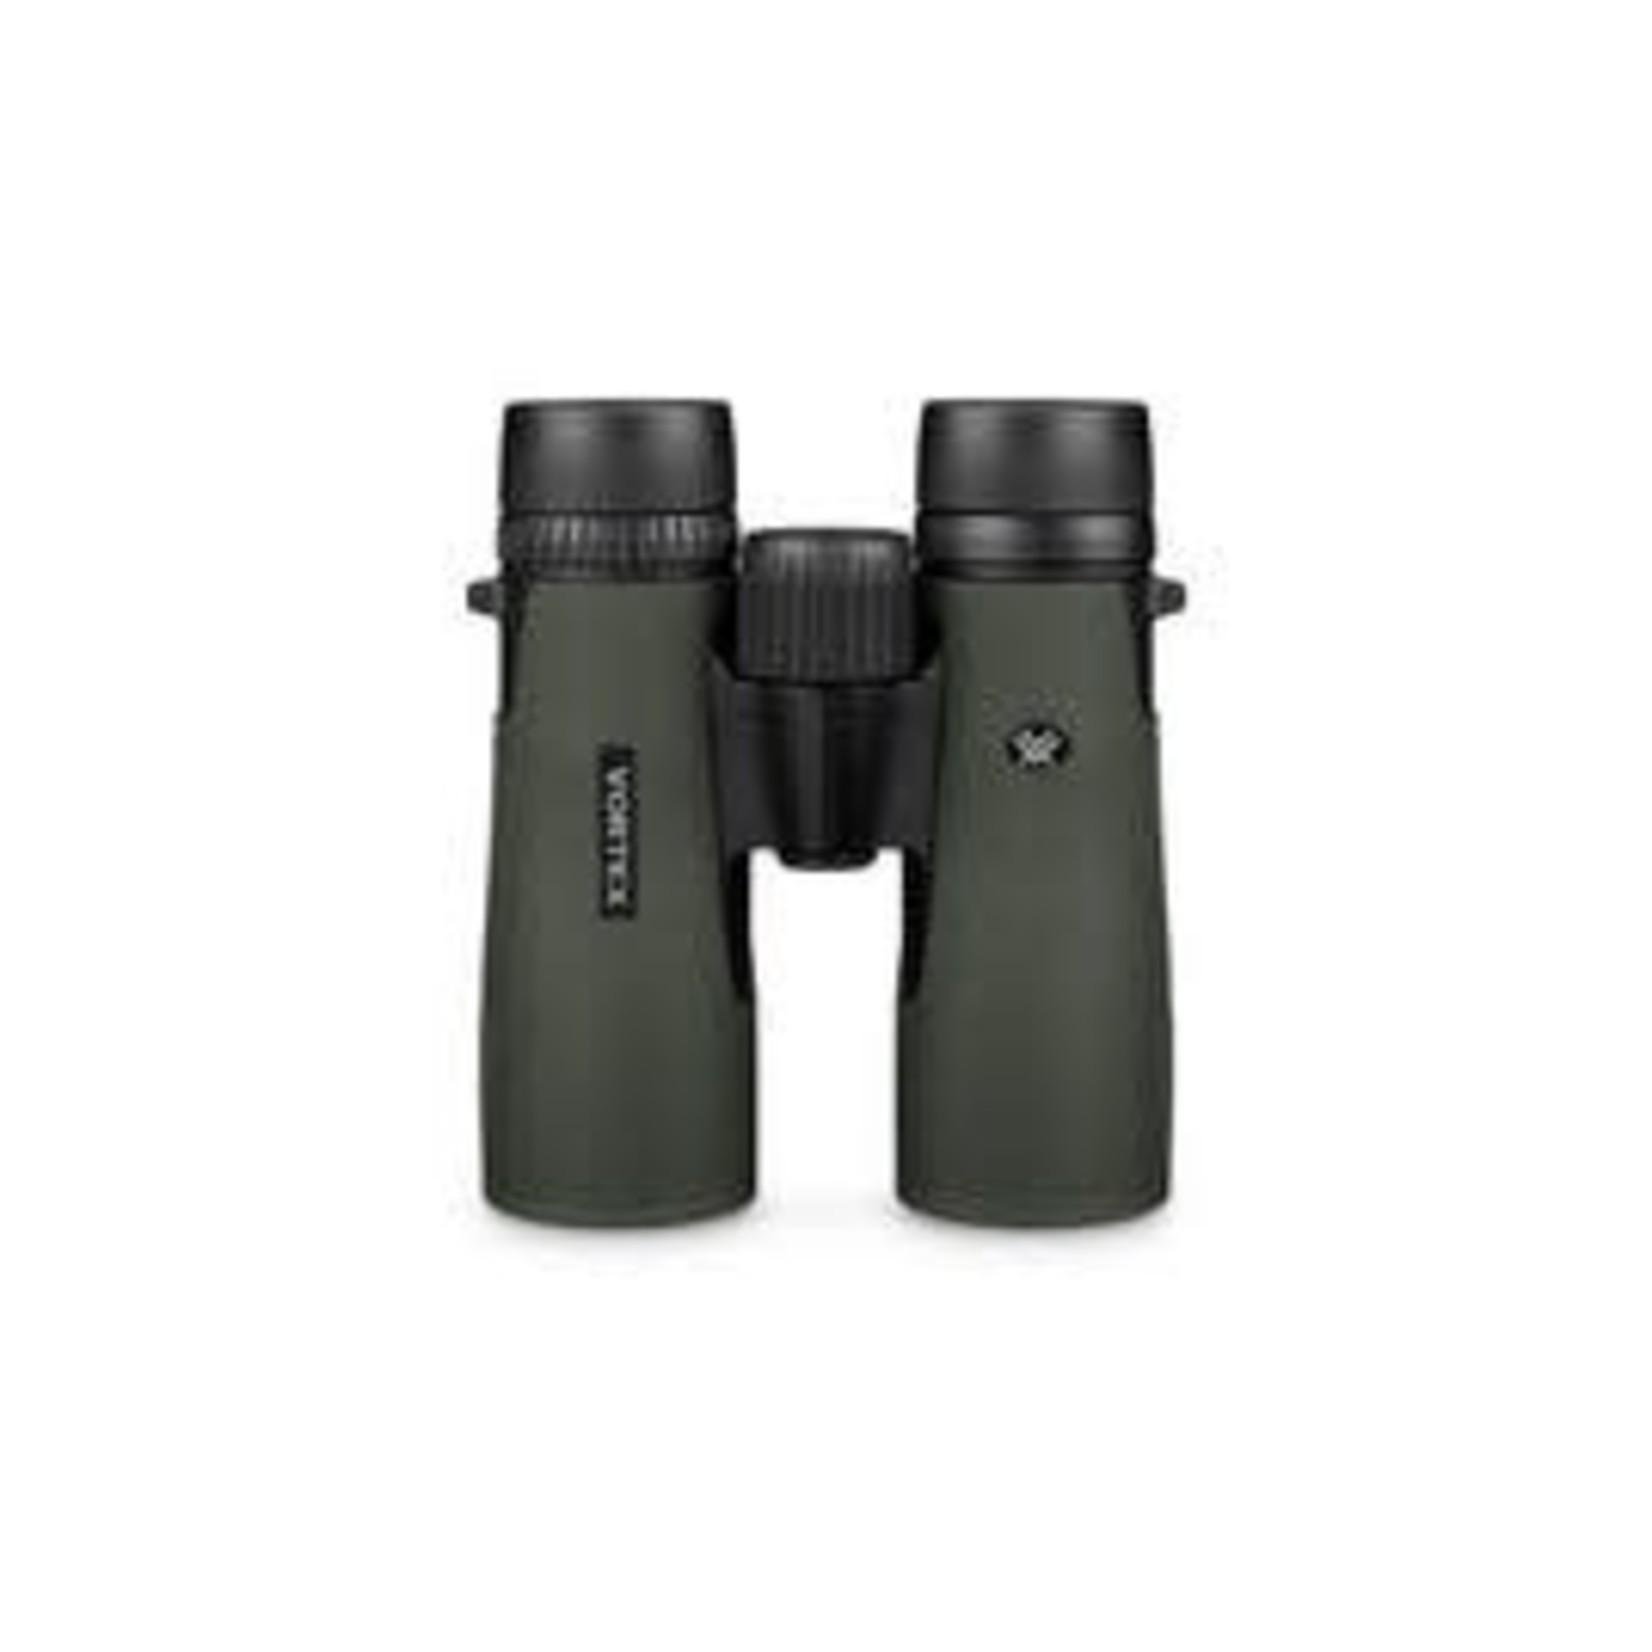 Vortex Vortex Diamondback HD 8x42 Binoculars